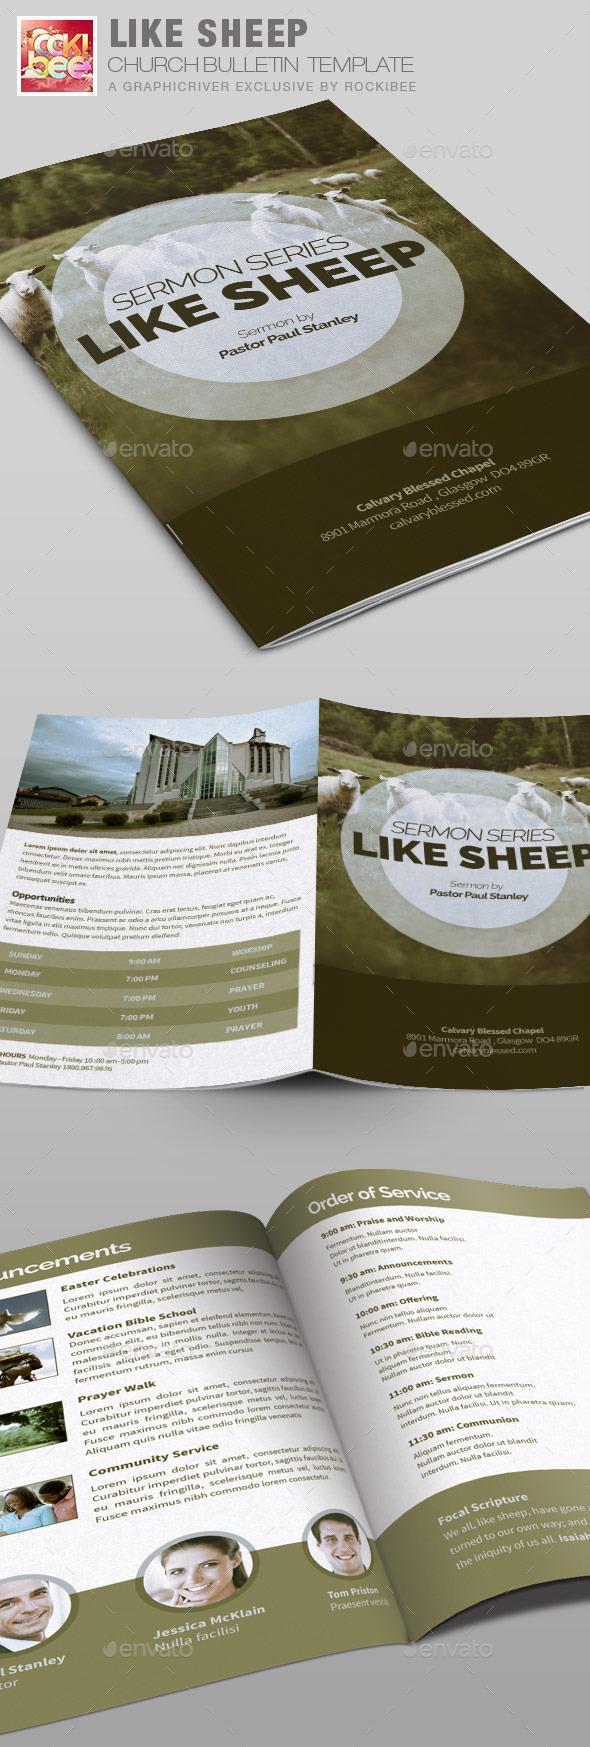 Like Sheep Church Bulletin Template - Informational Brochures